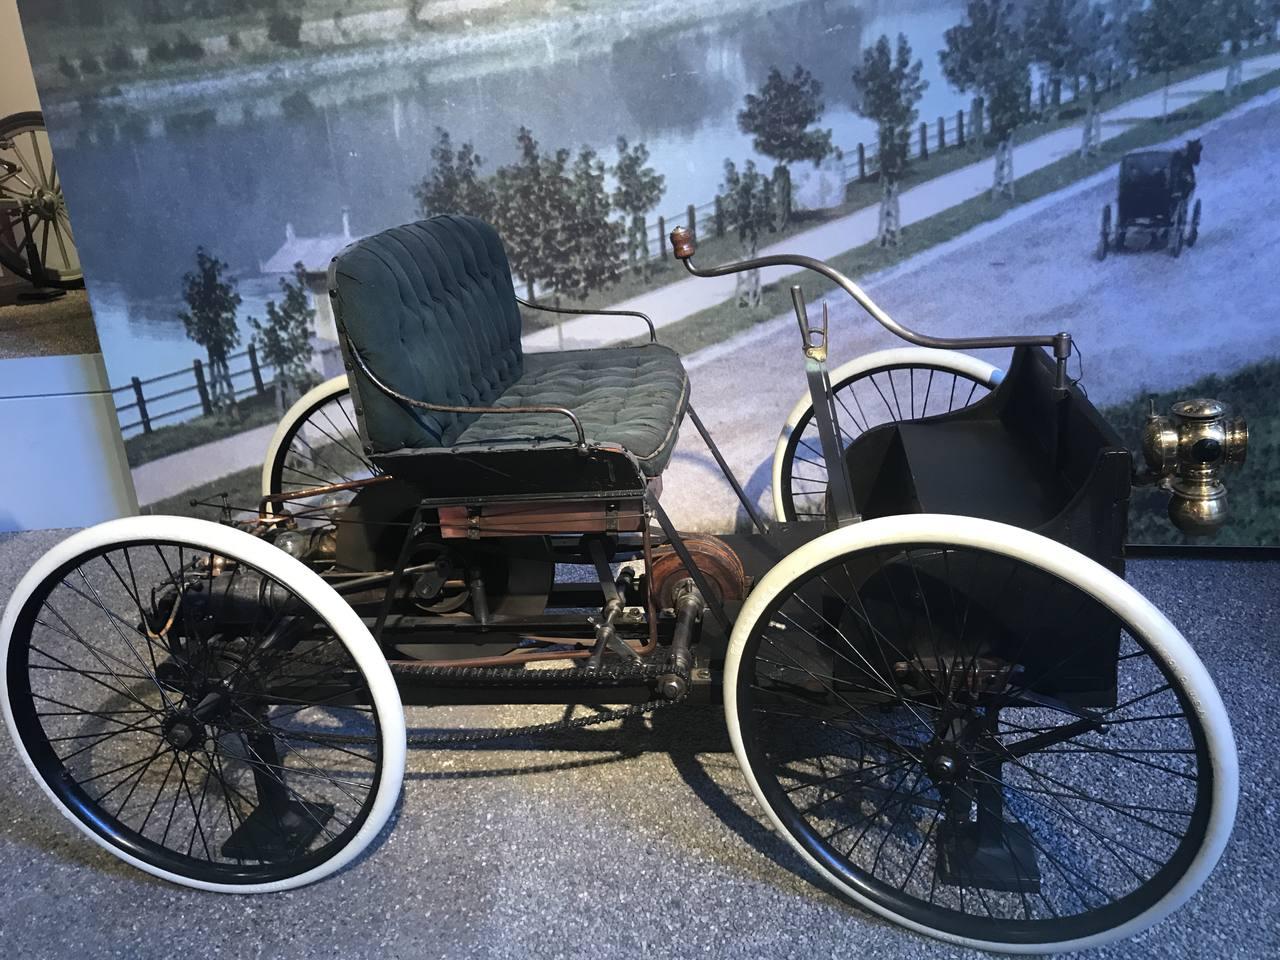 Ford's first car - The Quadrangle